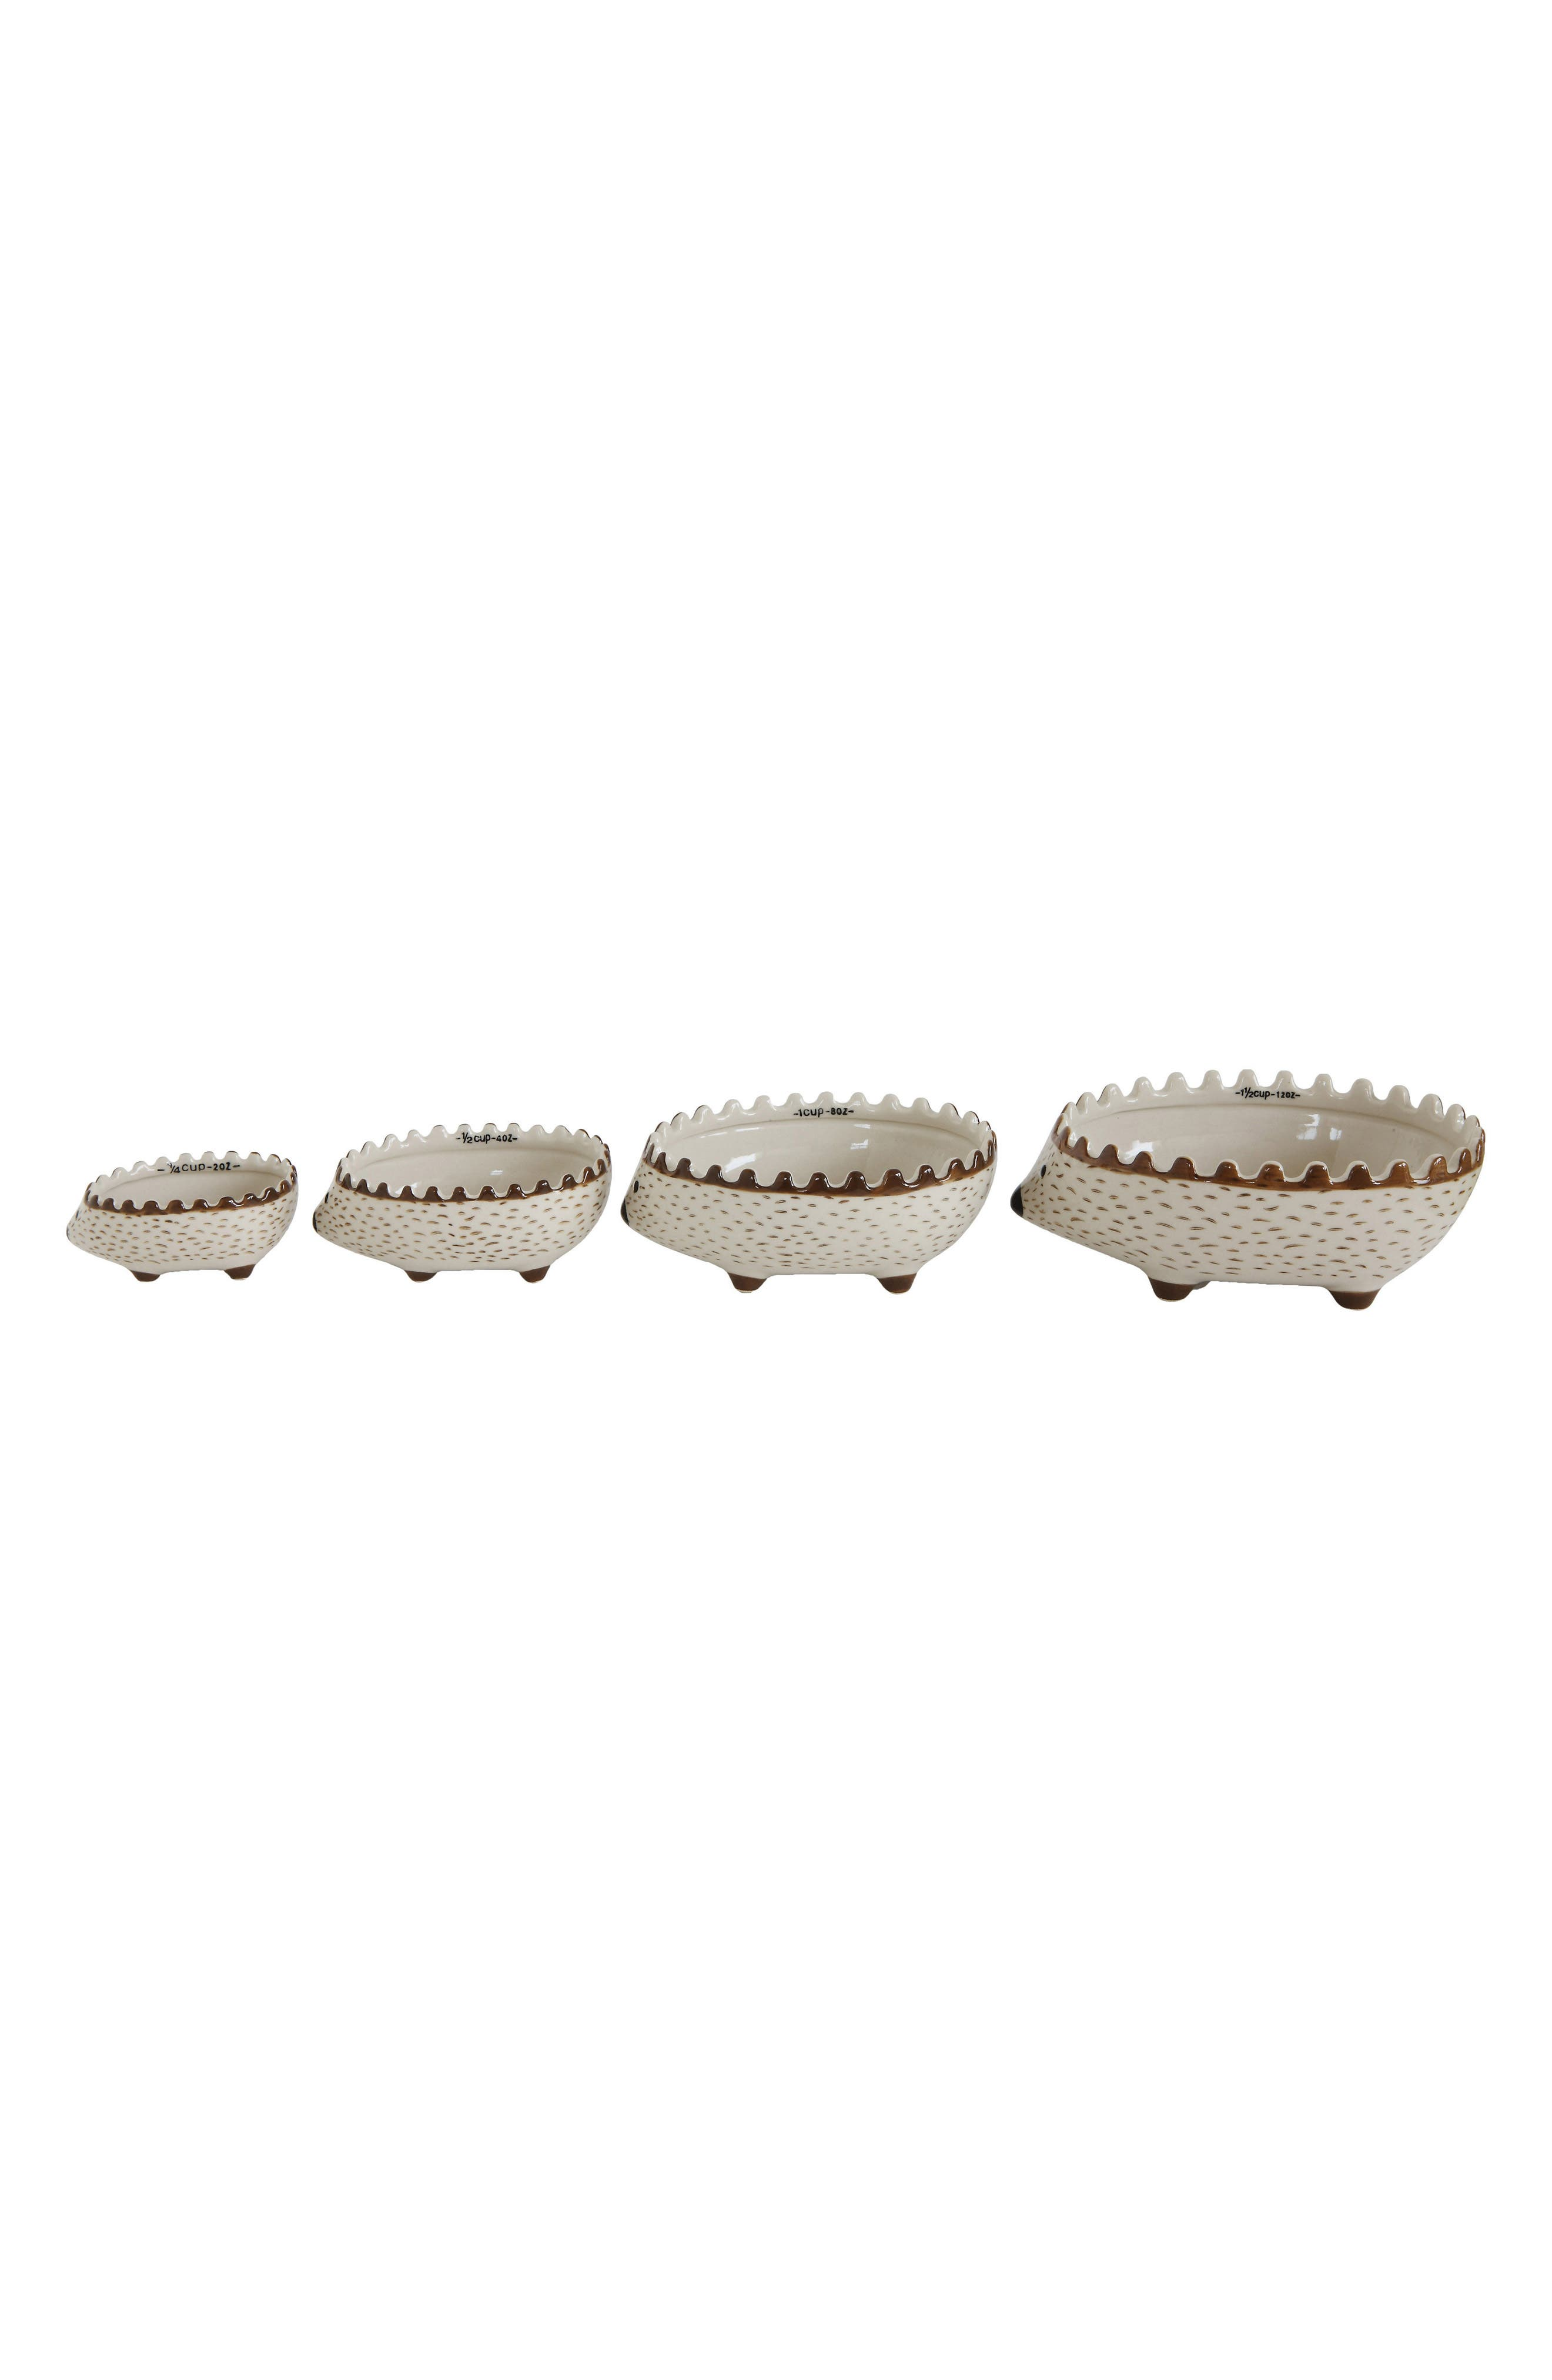 Set of 4 Hedgehog Measuring Cups,                         Main,                         color, White